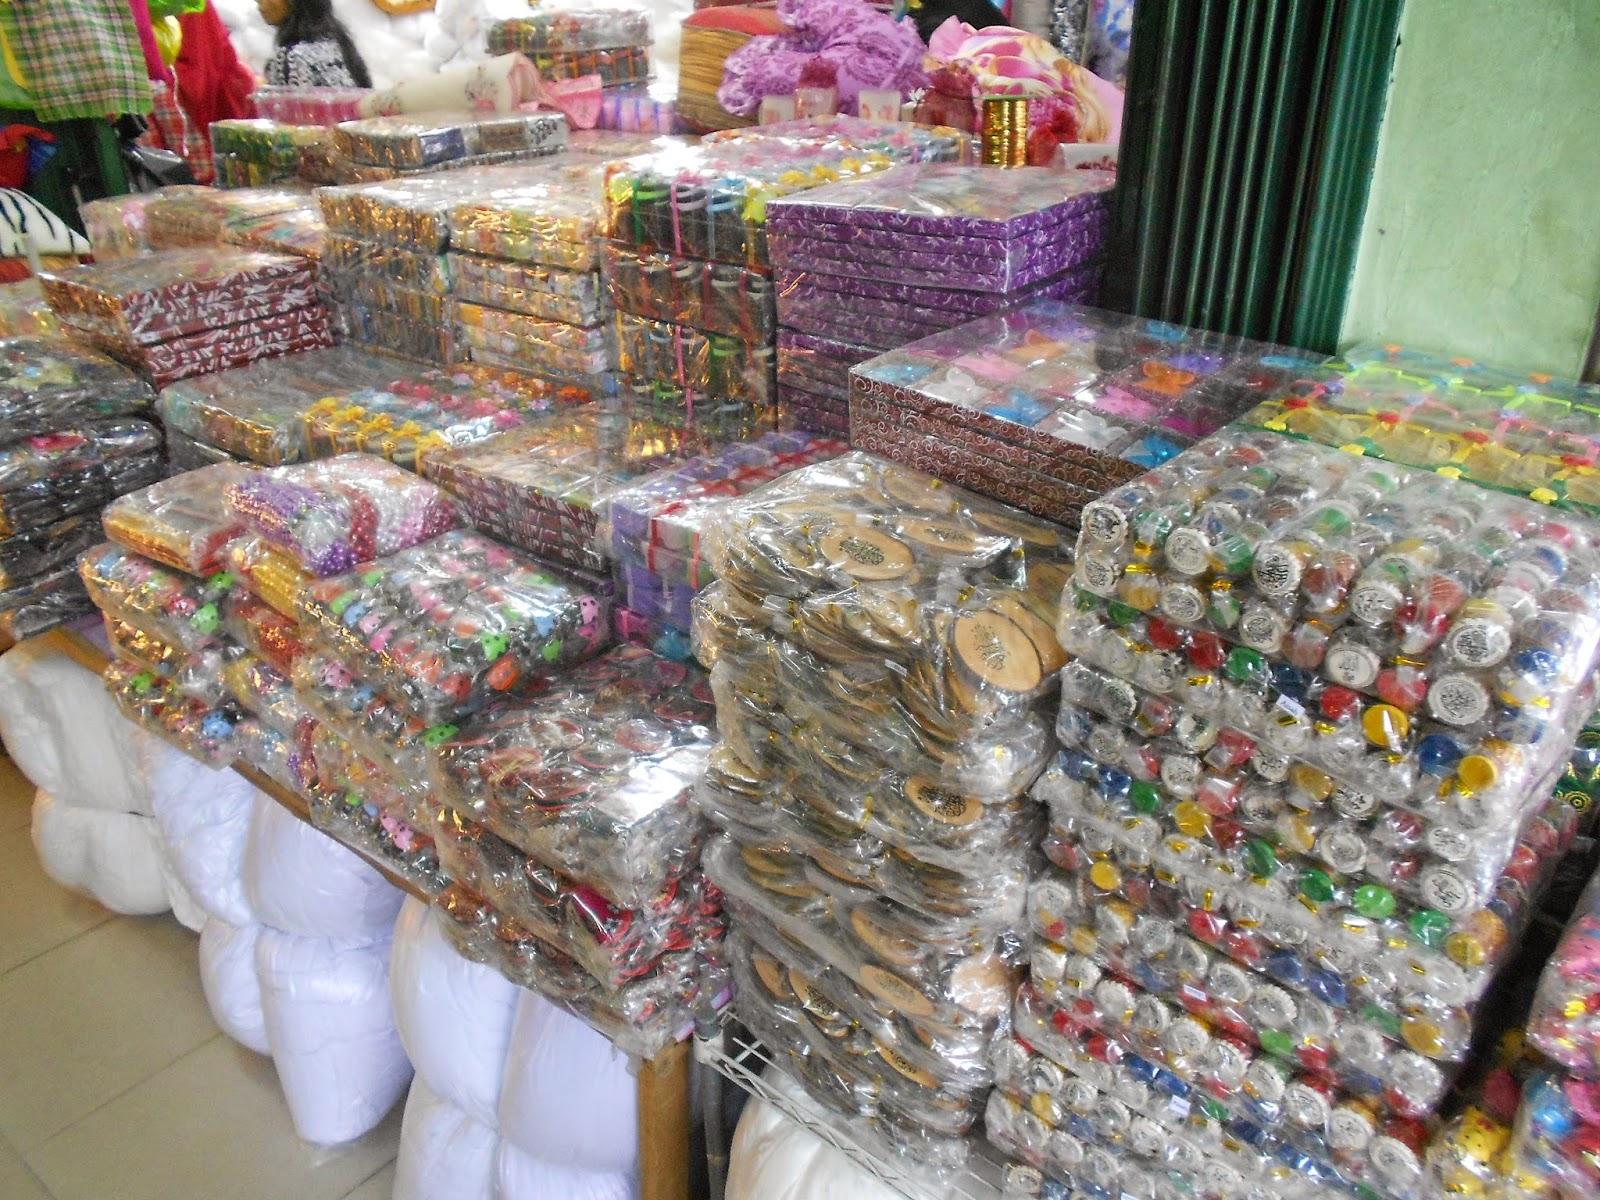 Pekanbaru Indonesia  City new picture : Jom Jalan Jalan: Bercuti di Pekanbaru, Indonesia : Membeli belah